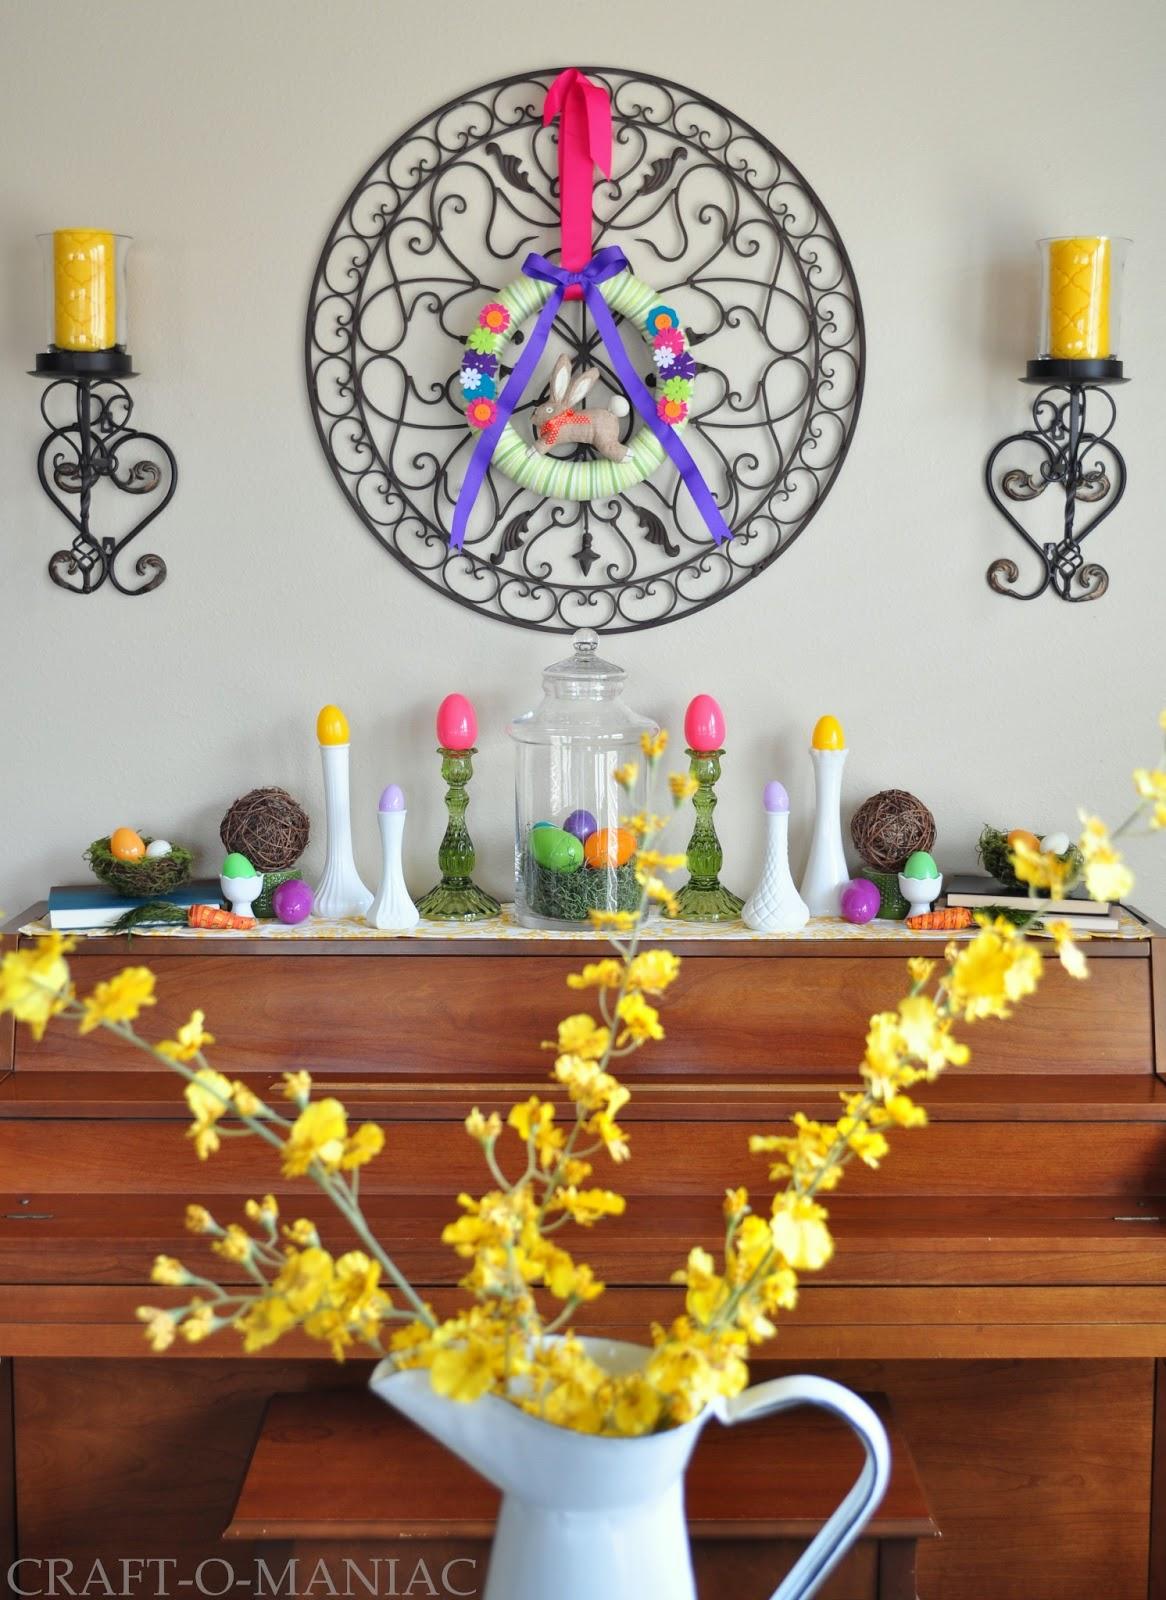 Home Decor Easter Decorated Piano Craft O Maniac